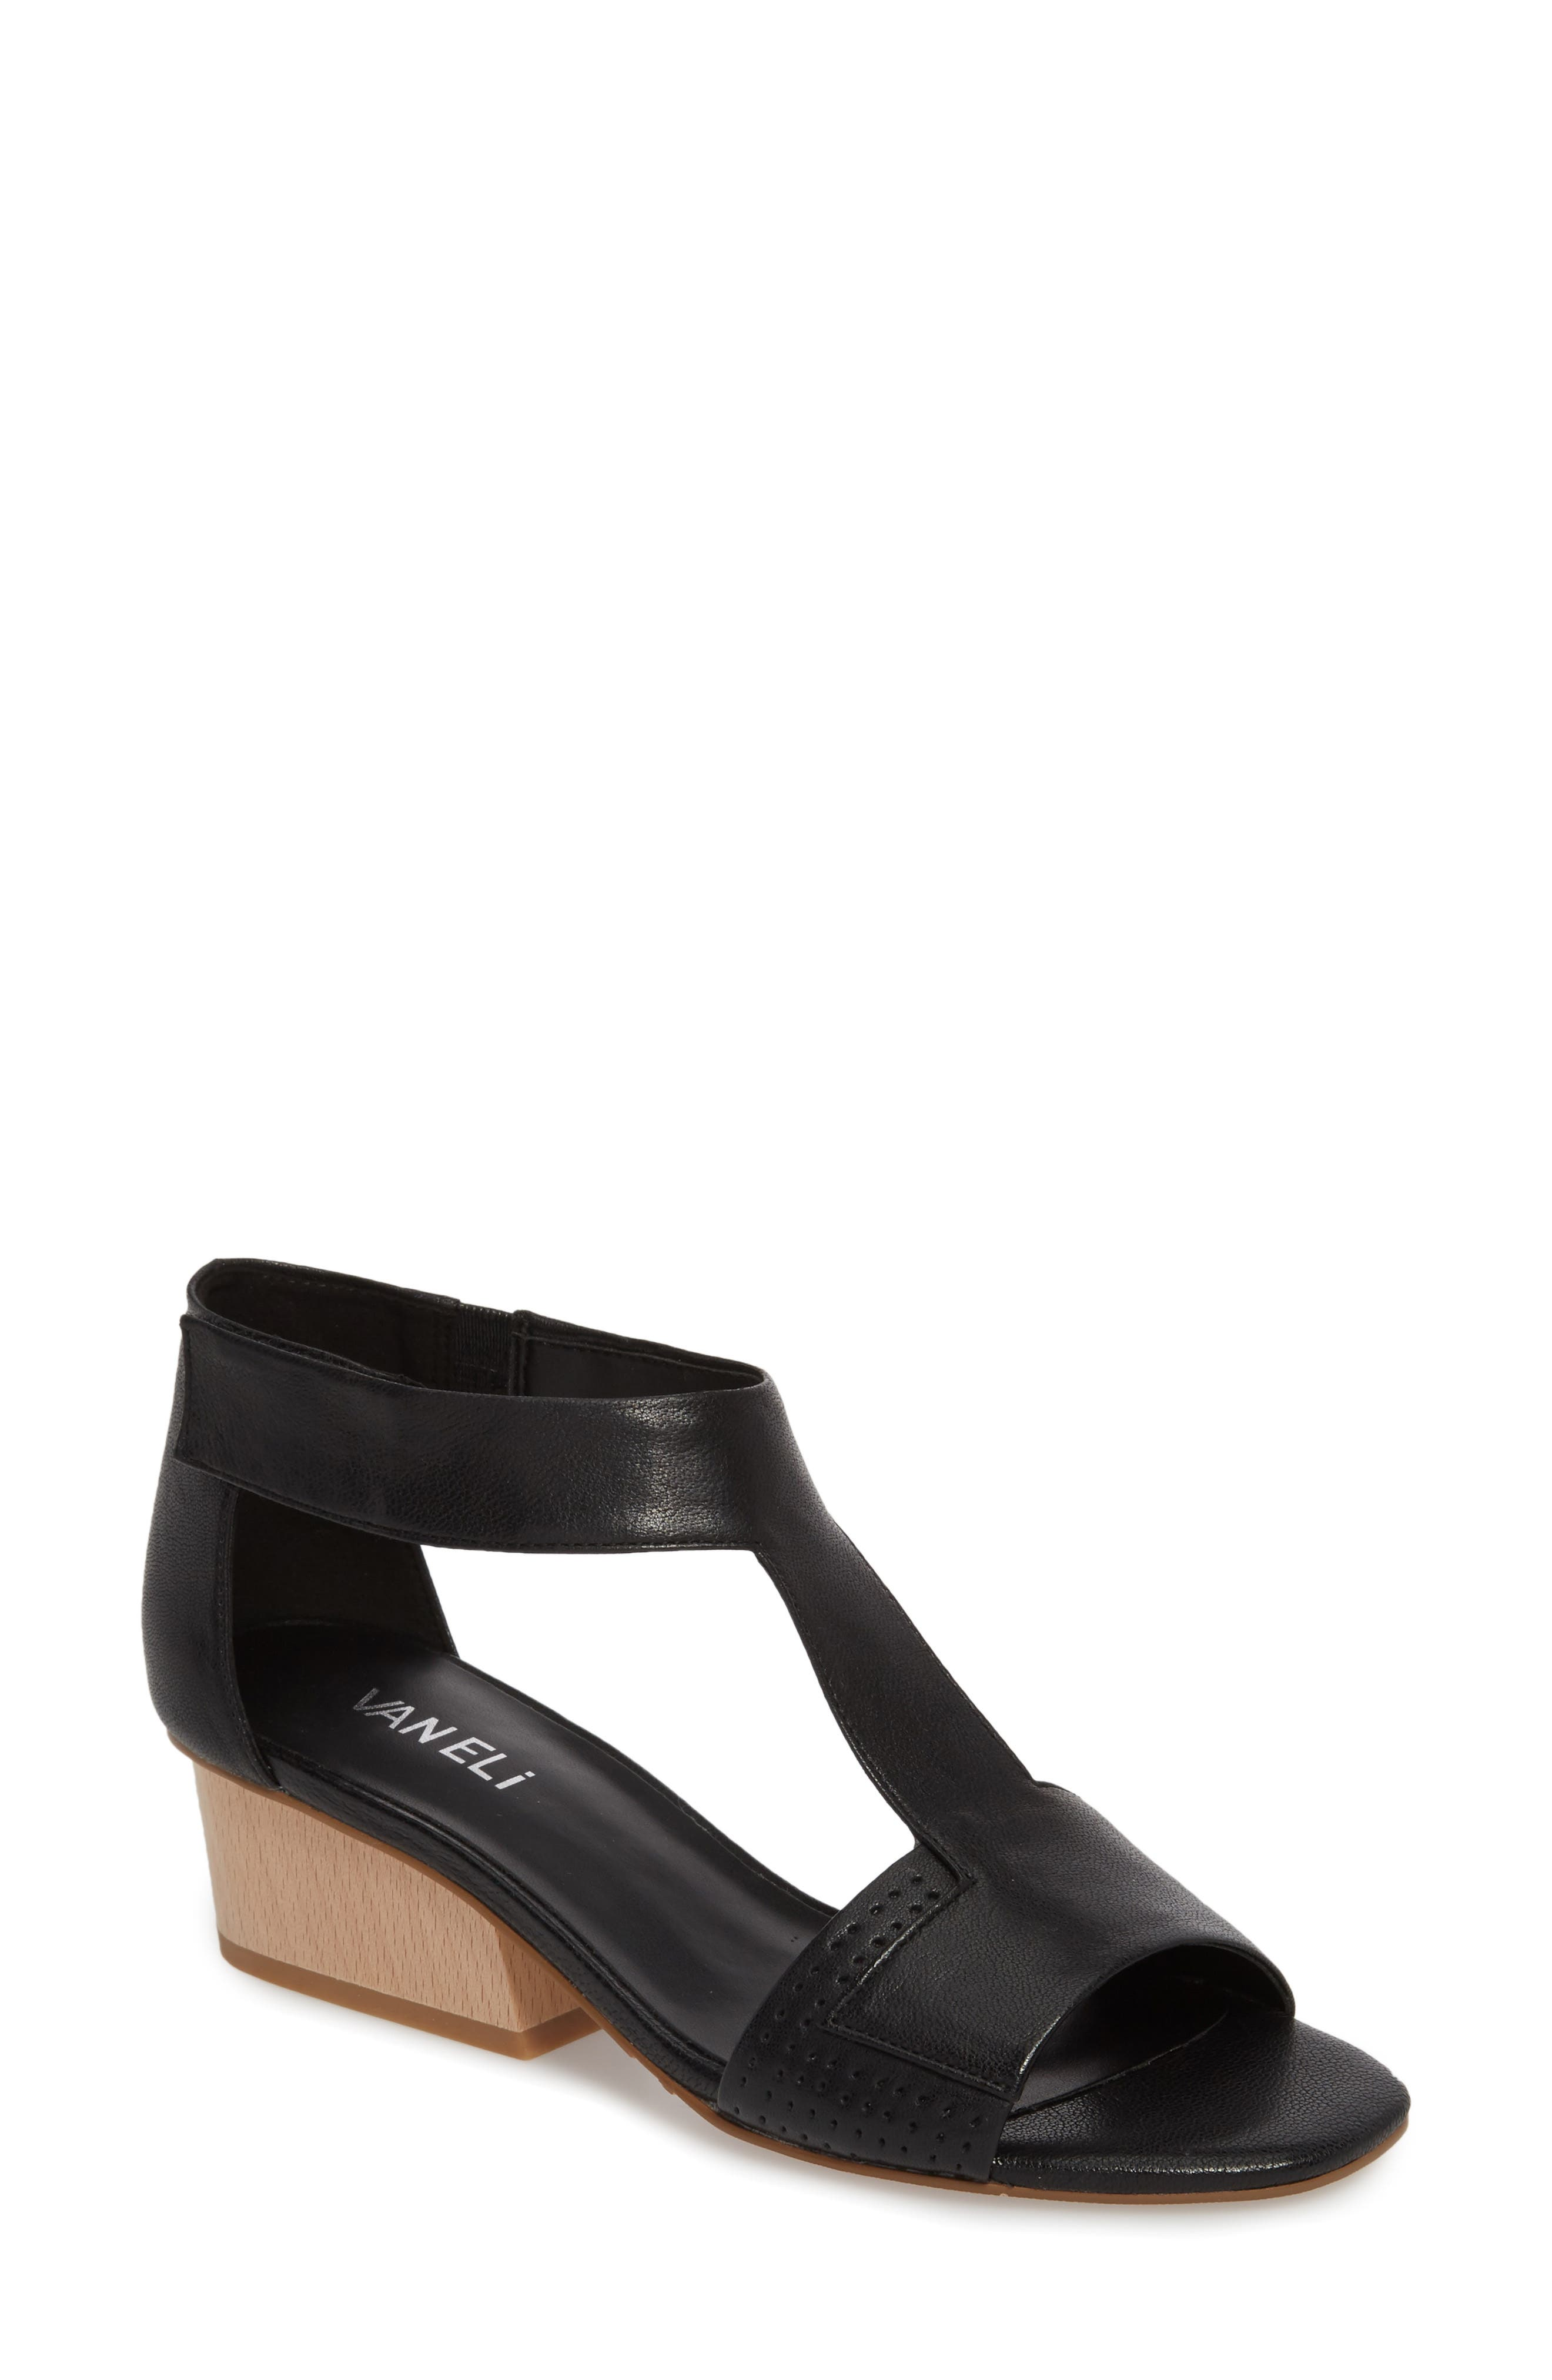 Calyx Block Heel Sandal,                         Main,                         color, BLACK LEATHER